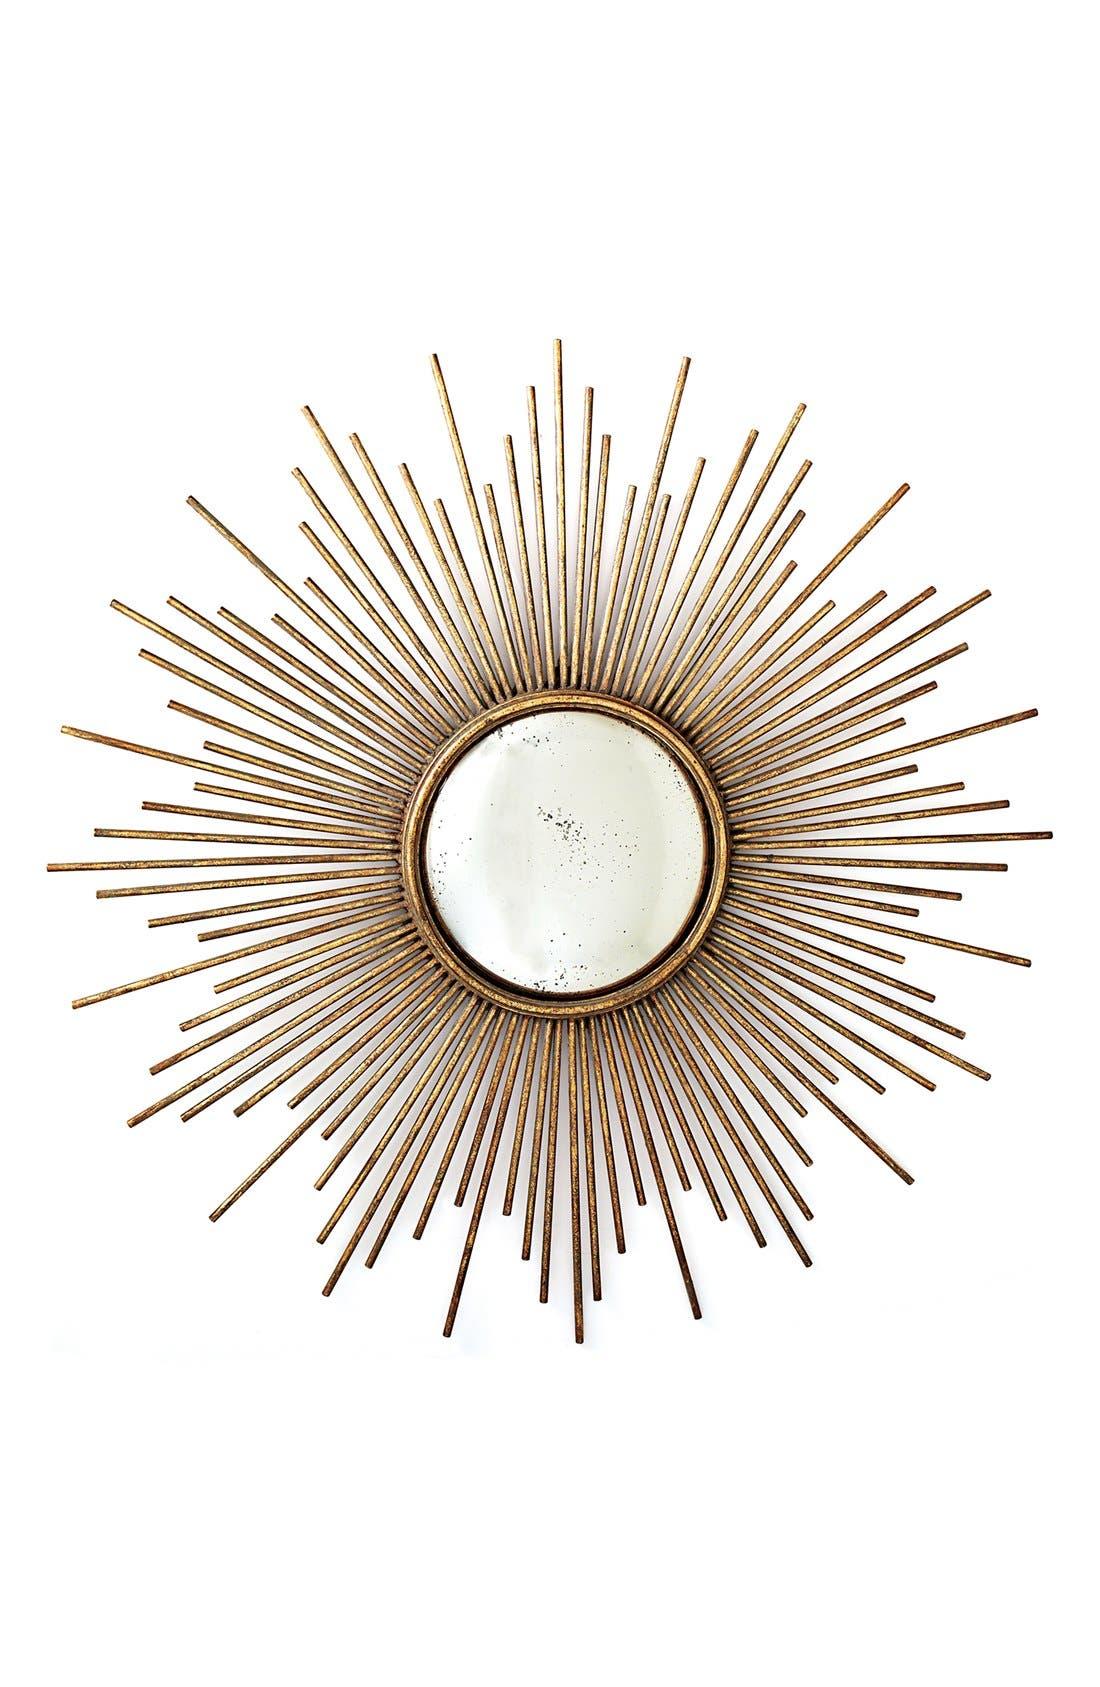 Alternate Image 1 Selected - Two's Company Sunburst Mirror